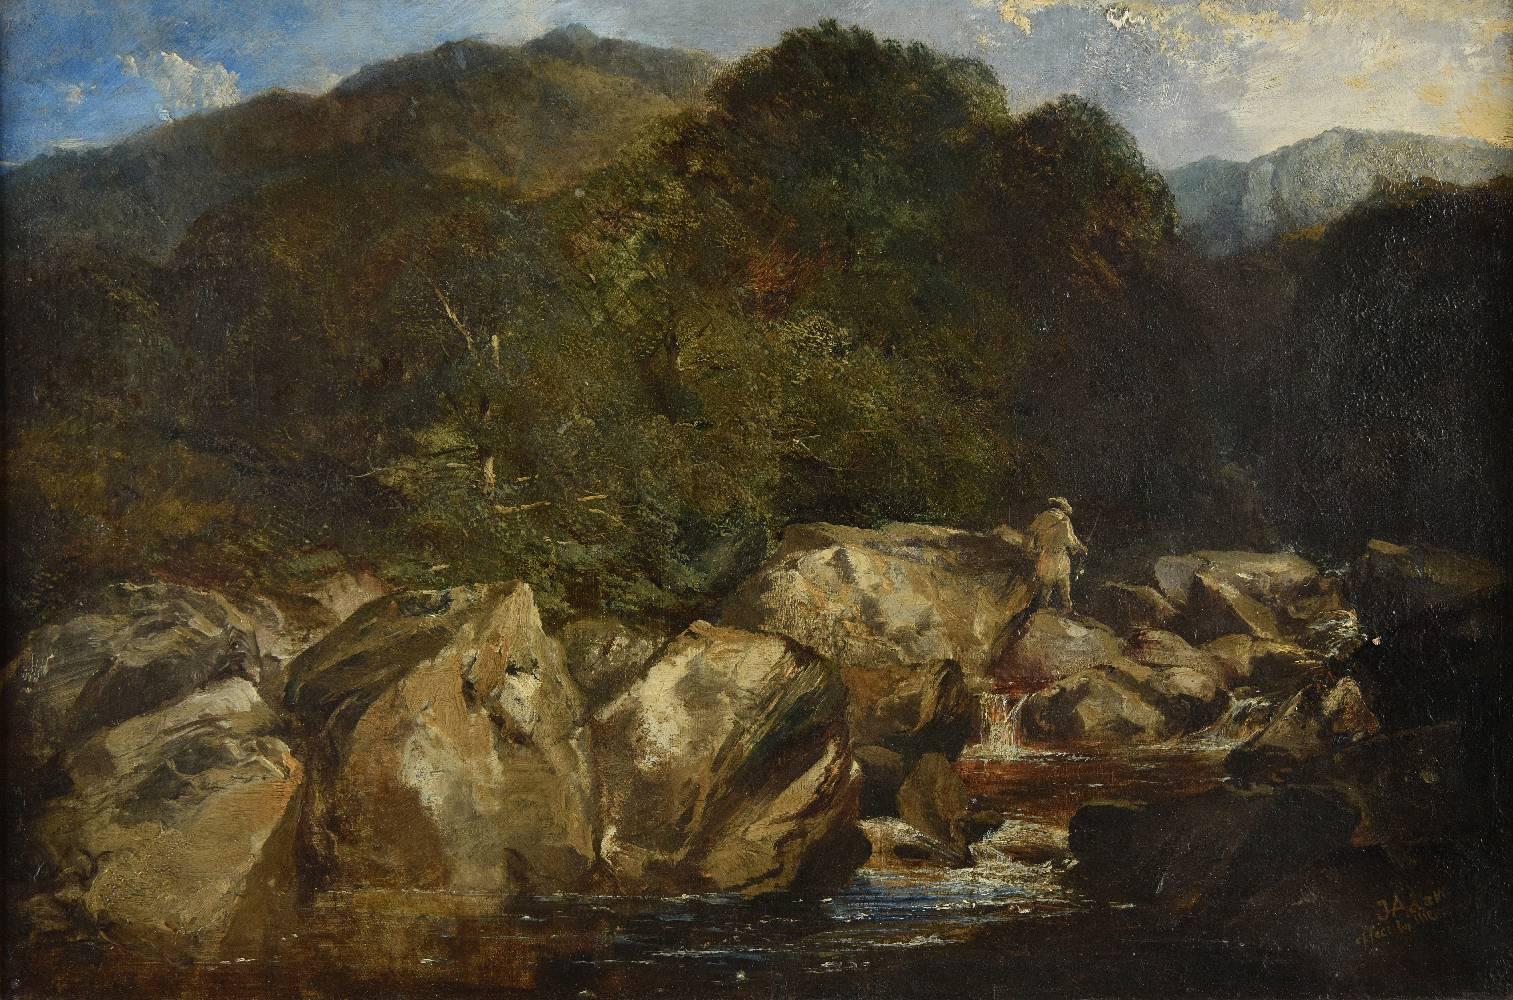 Lot 25 - *Adam (Joseph Denovan, 1842-1896 & Niemann, Edmund John, 1813-1876). Fisherman in the Highlands,